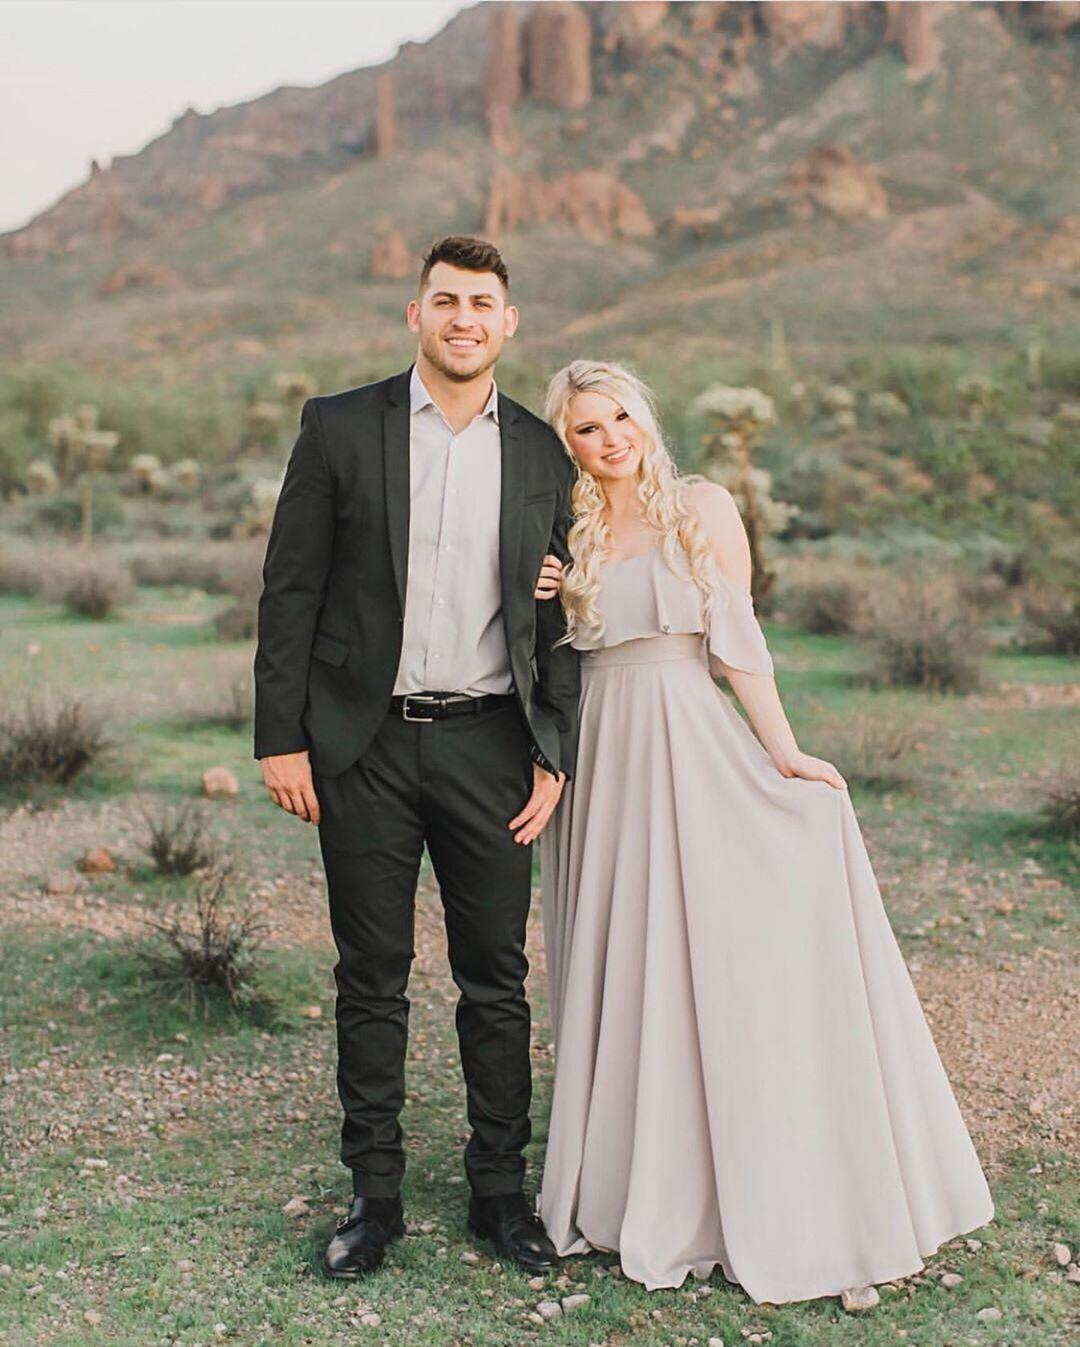 Morning Lavender Shopmorninglavender Instagram Photos And Videos Https Morninglavender Com Produ Ruffled Maxi Dress Wedding Guest Style Couple Outfits [ 1347 x 1080 Pixel ]